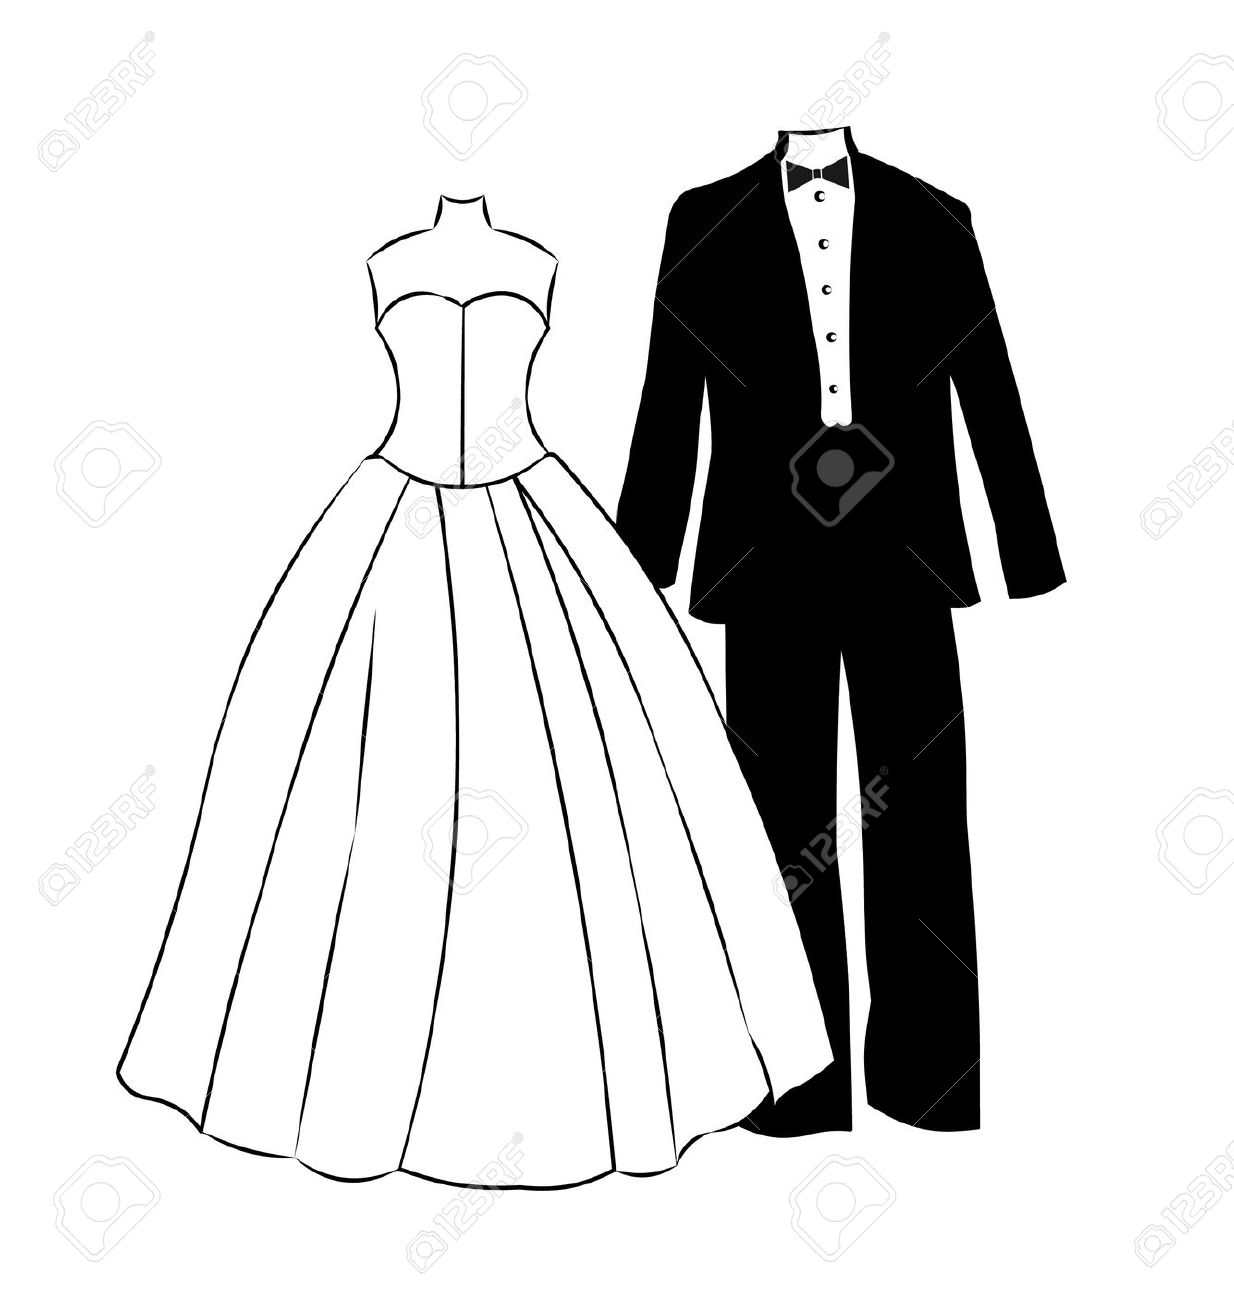 cartoon wedding dress clipart - clipground